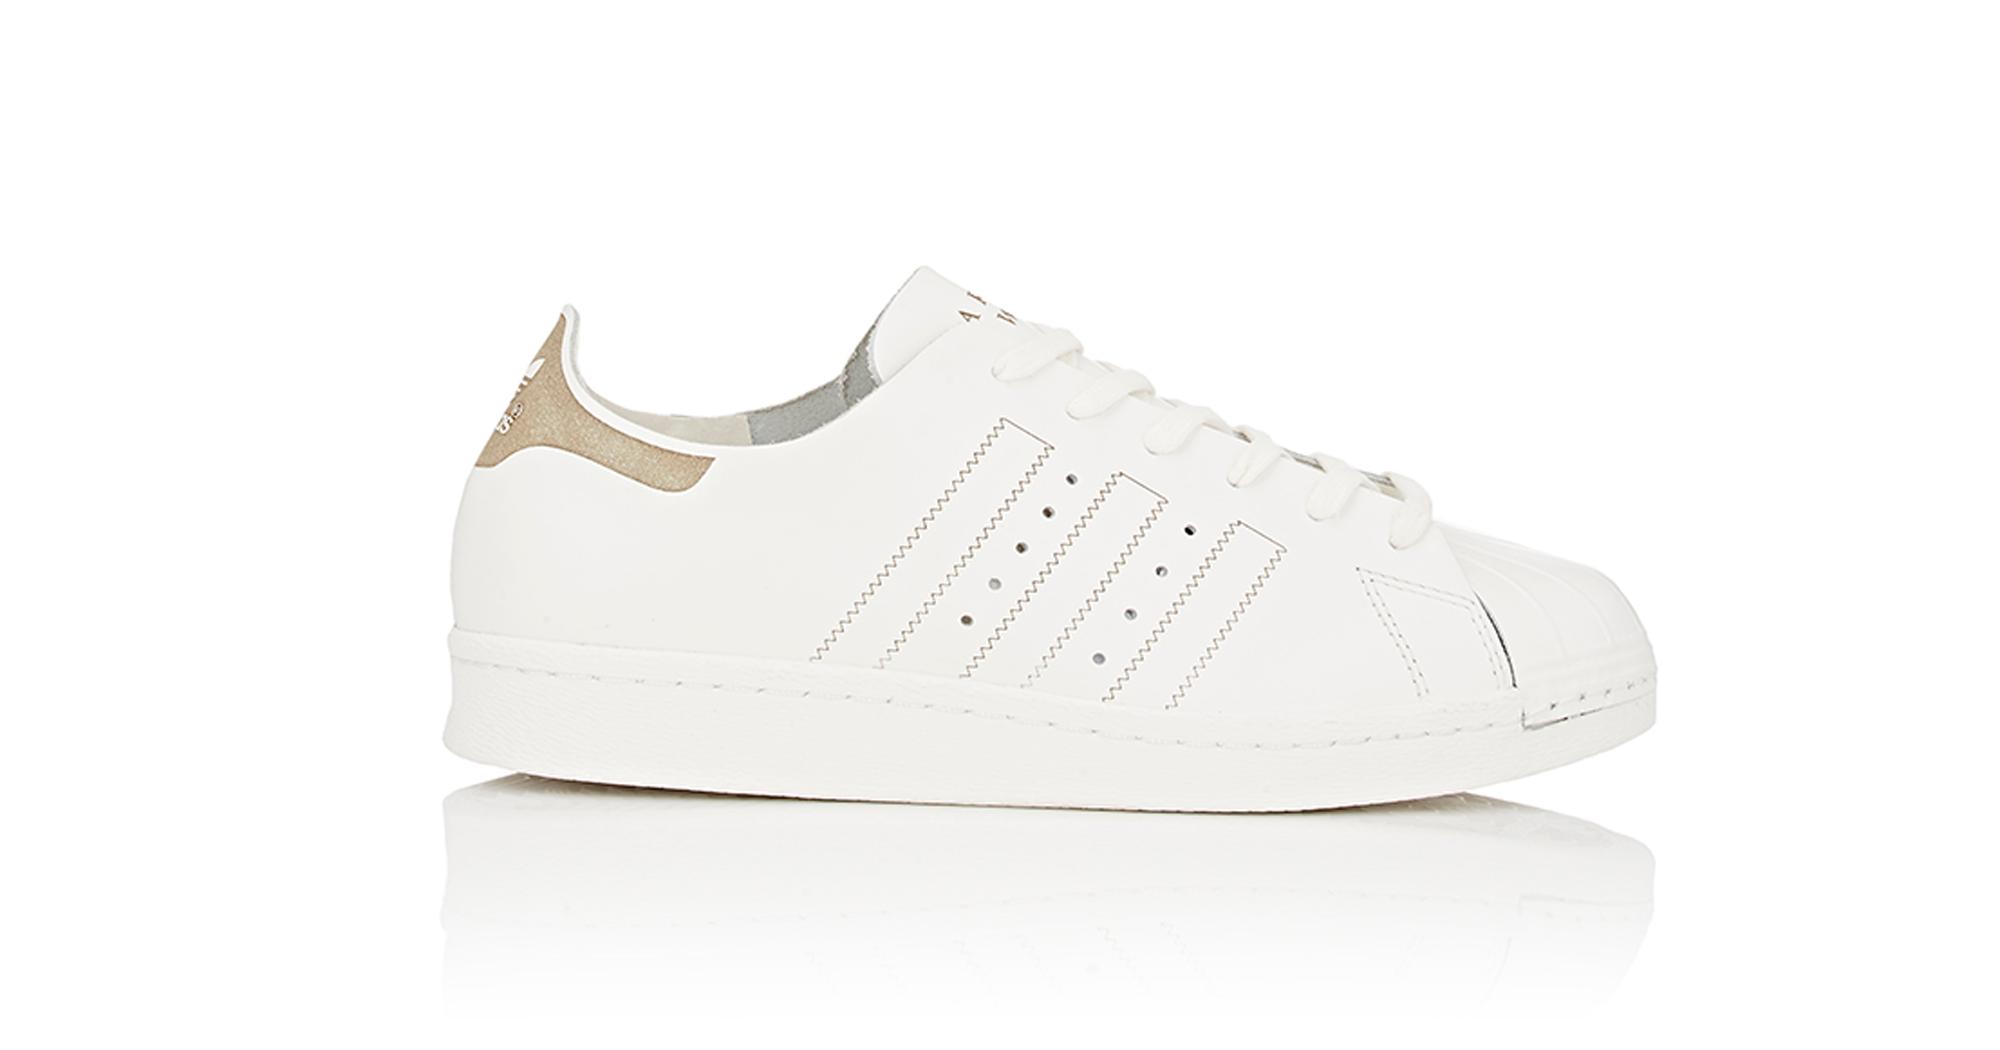 a83d3d87e4e7 Adidas New Superstar Sneakers Best Sellers